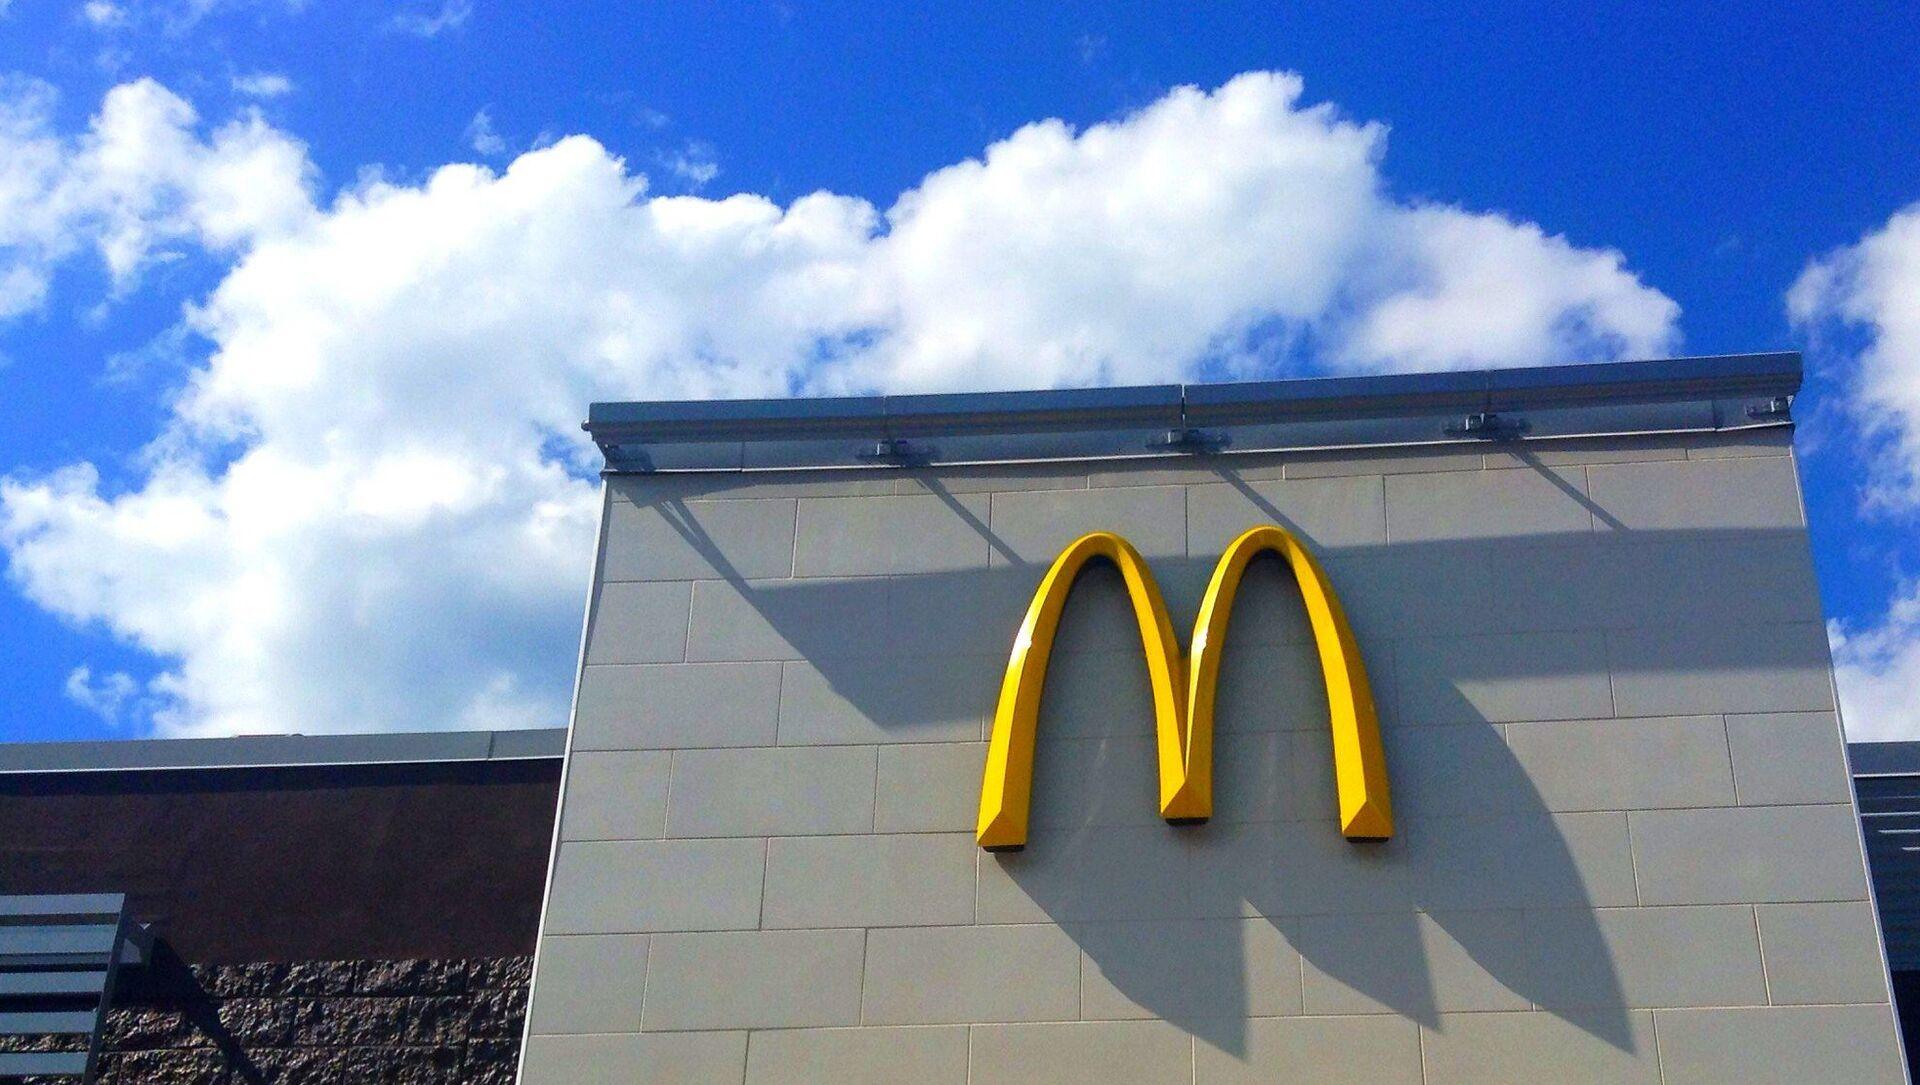 McDonald's - Sputnik France, 1920, 07.08.2021